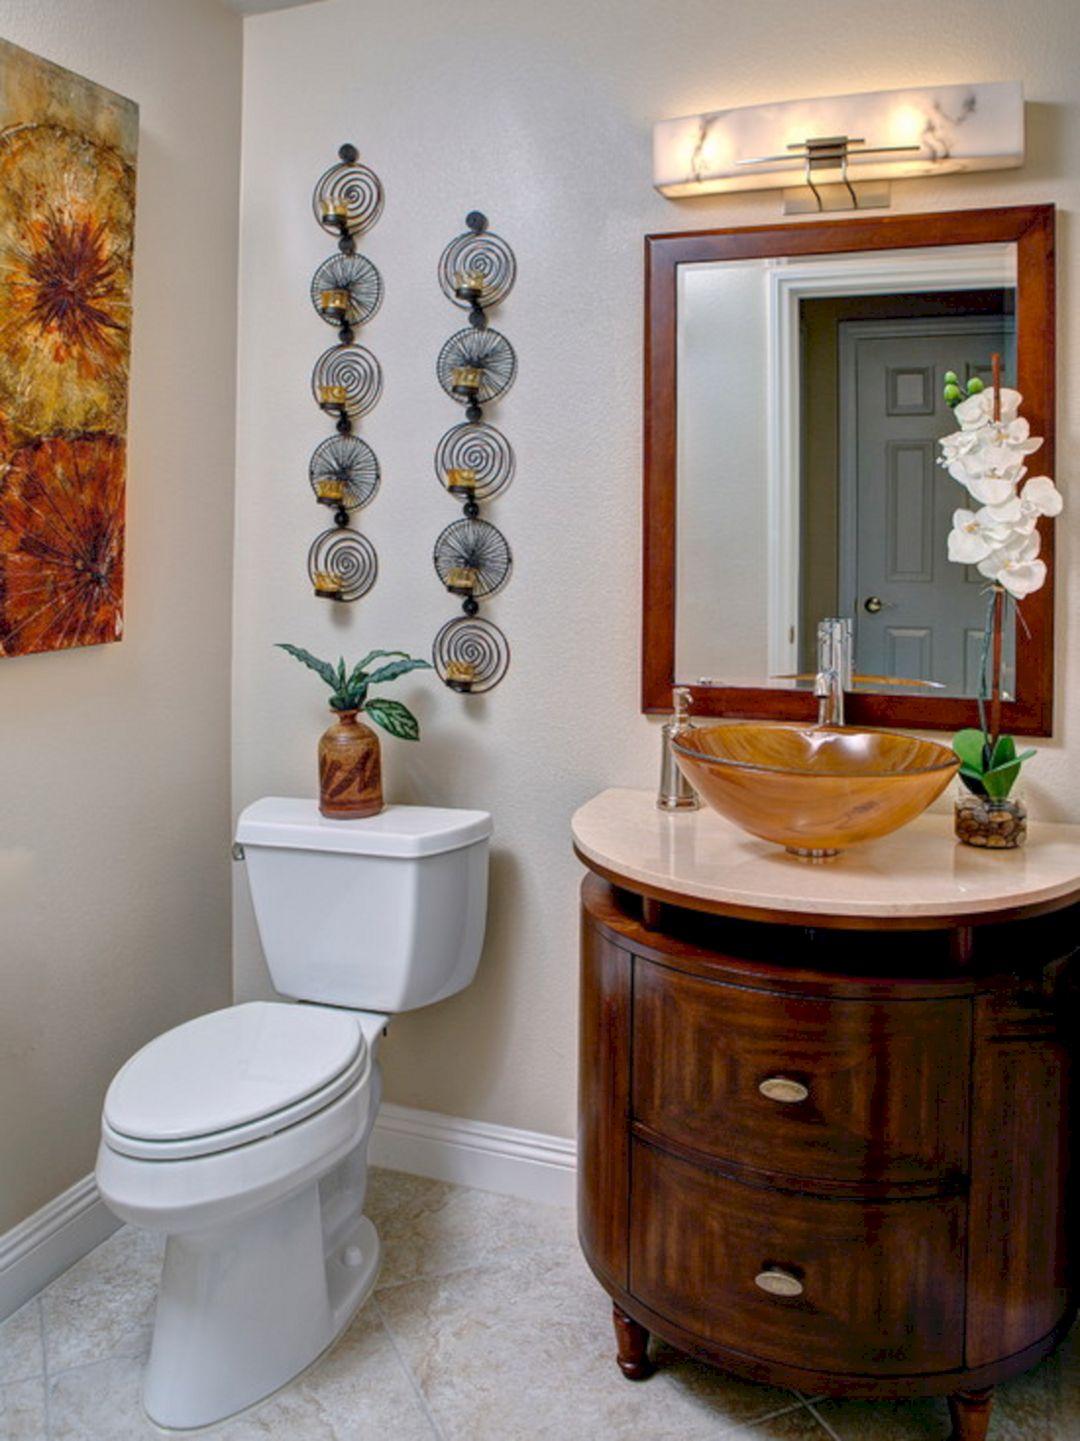 Girly Bathroom Wall Decor Novocom Top